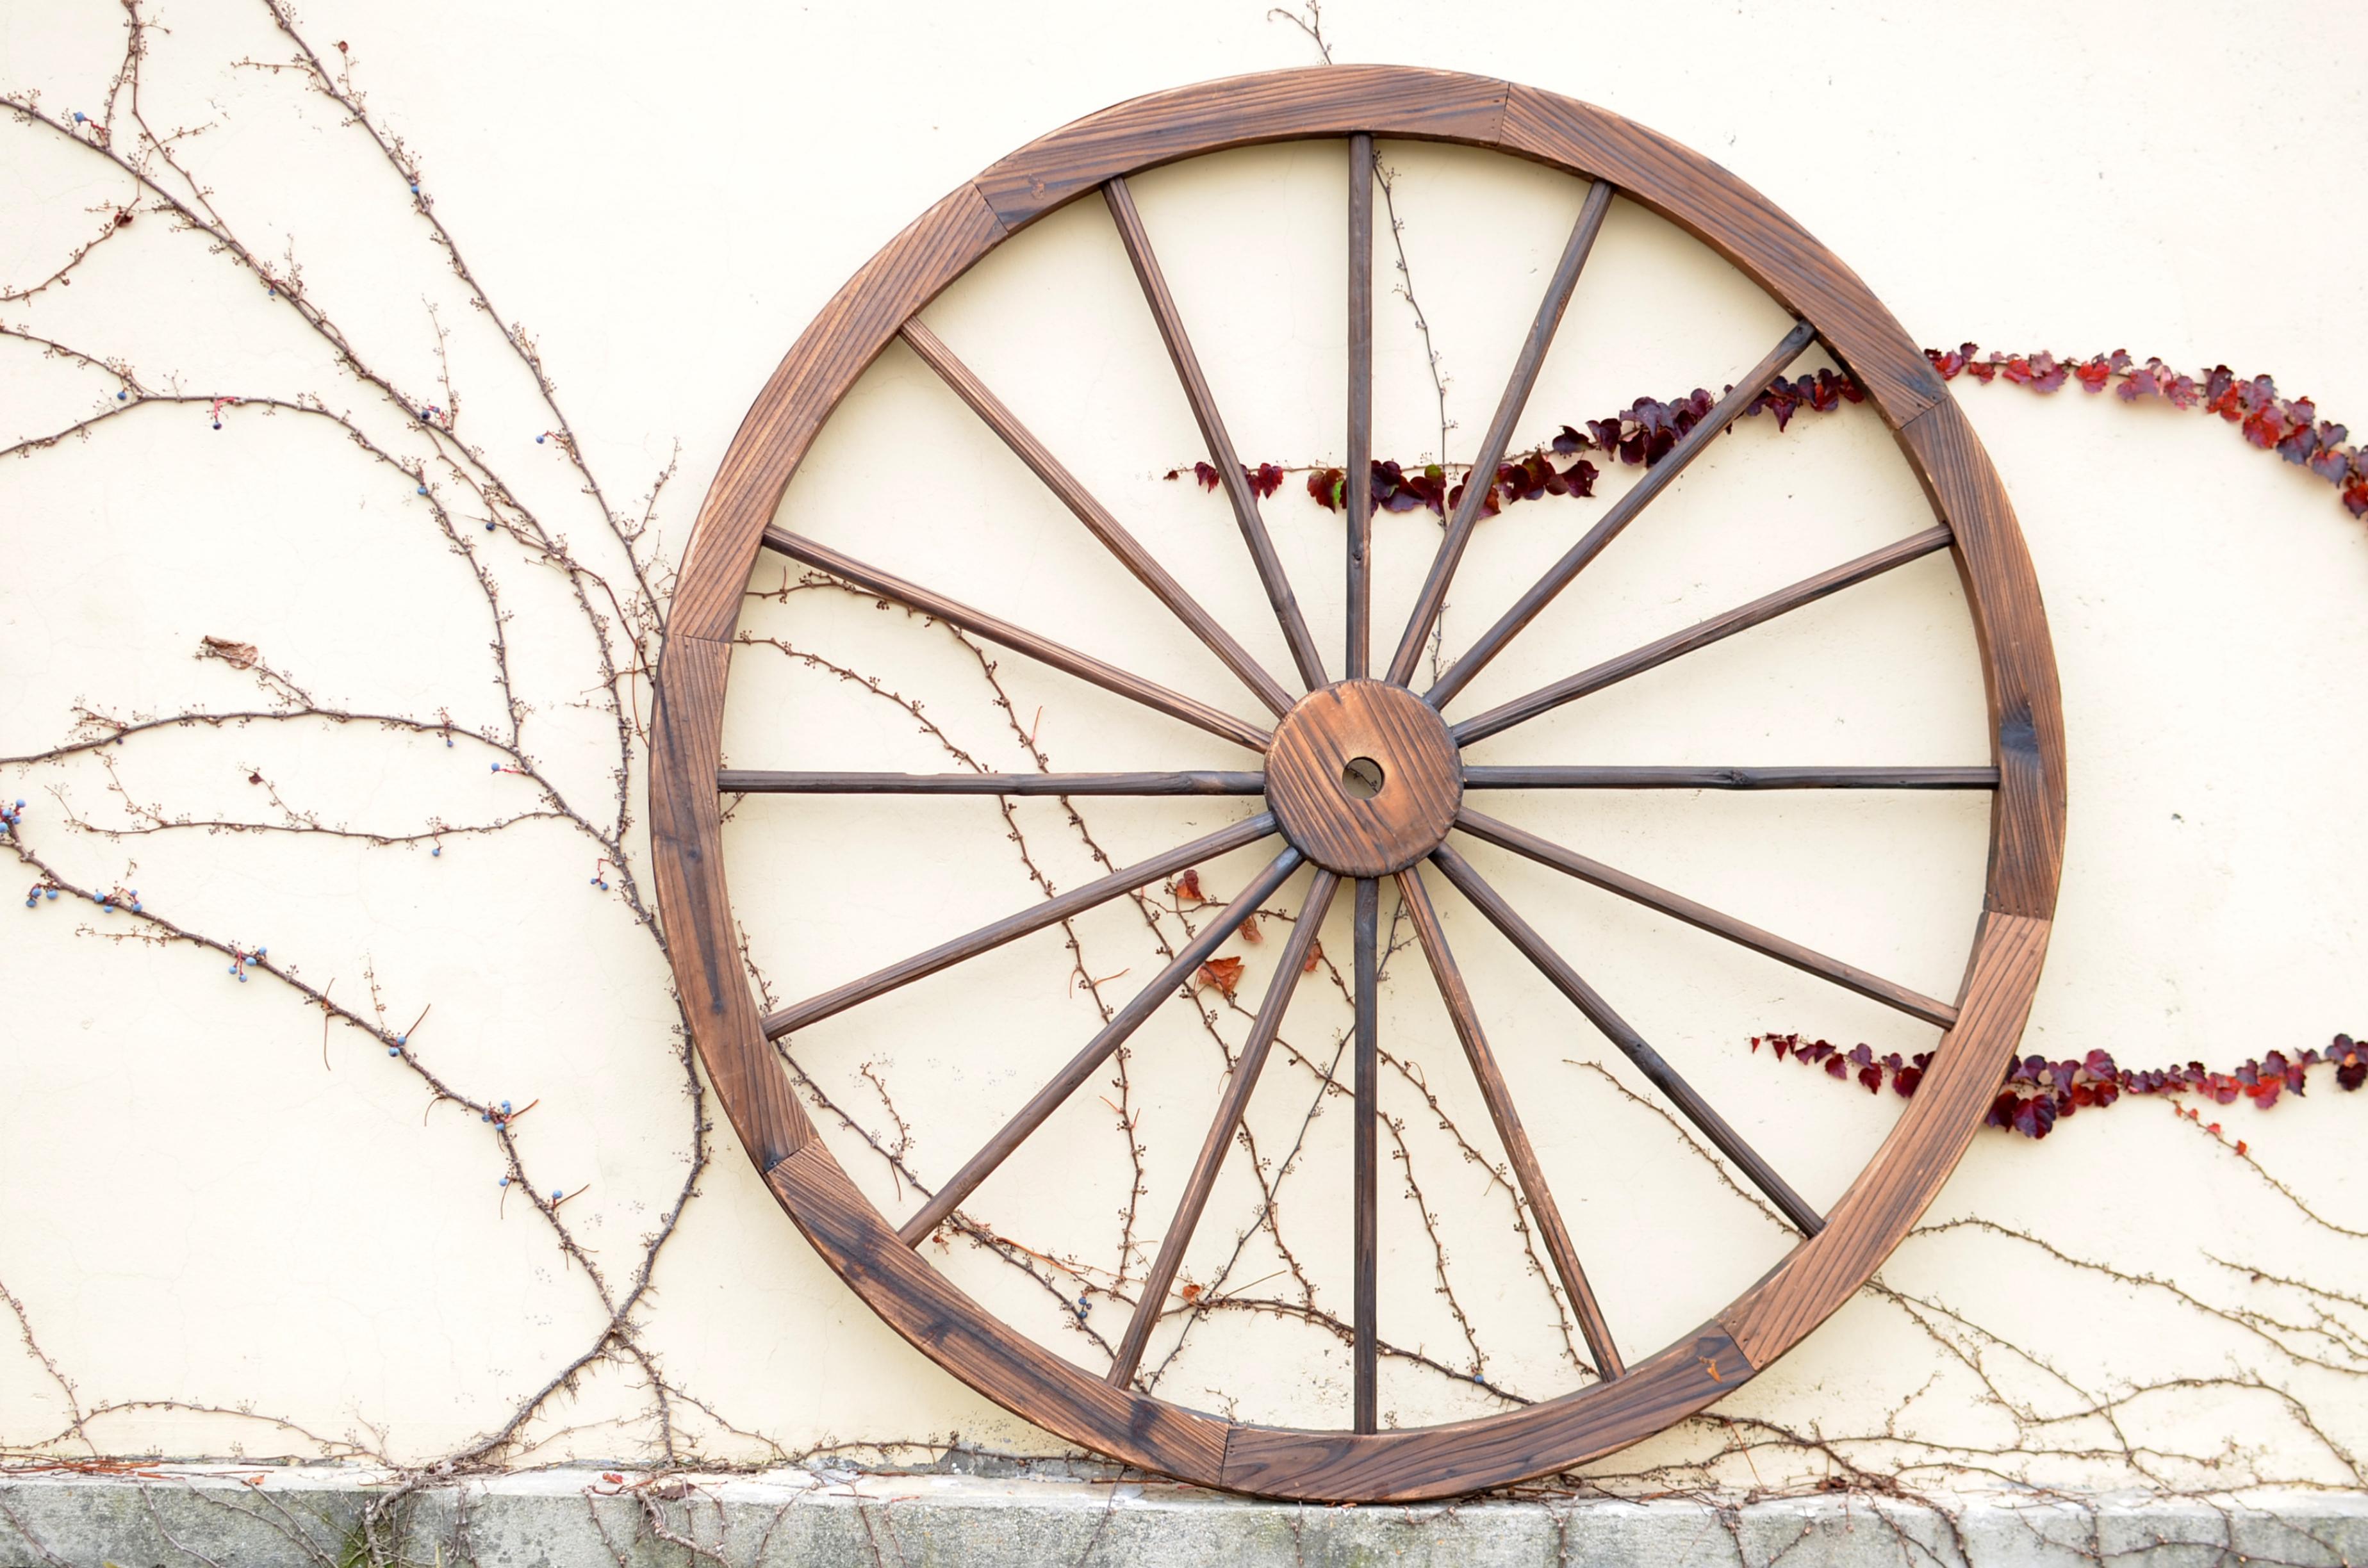 New 24 32 36 48 In Decorative Wood Garden Wagon Wheel Garden Decor